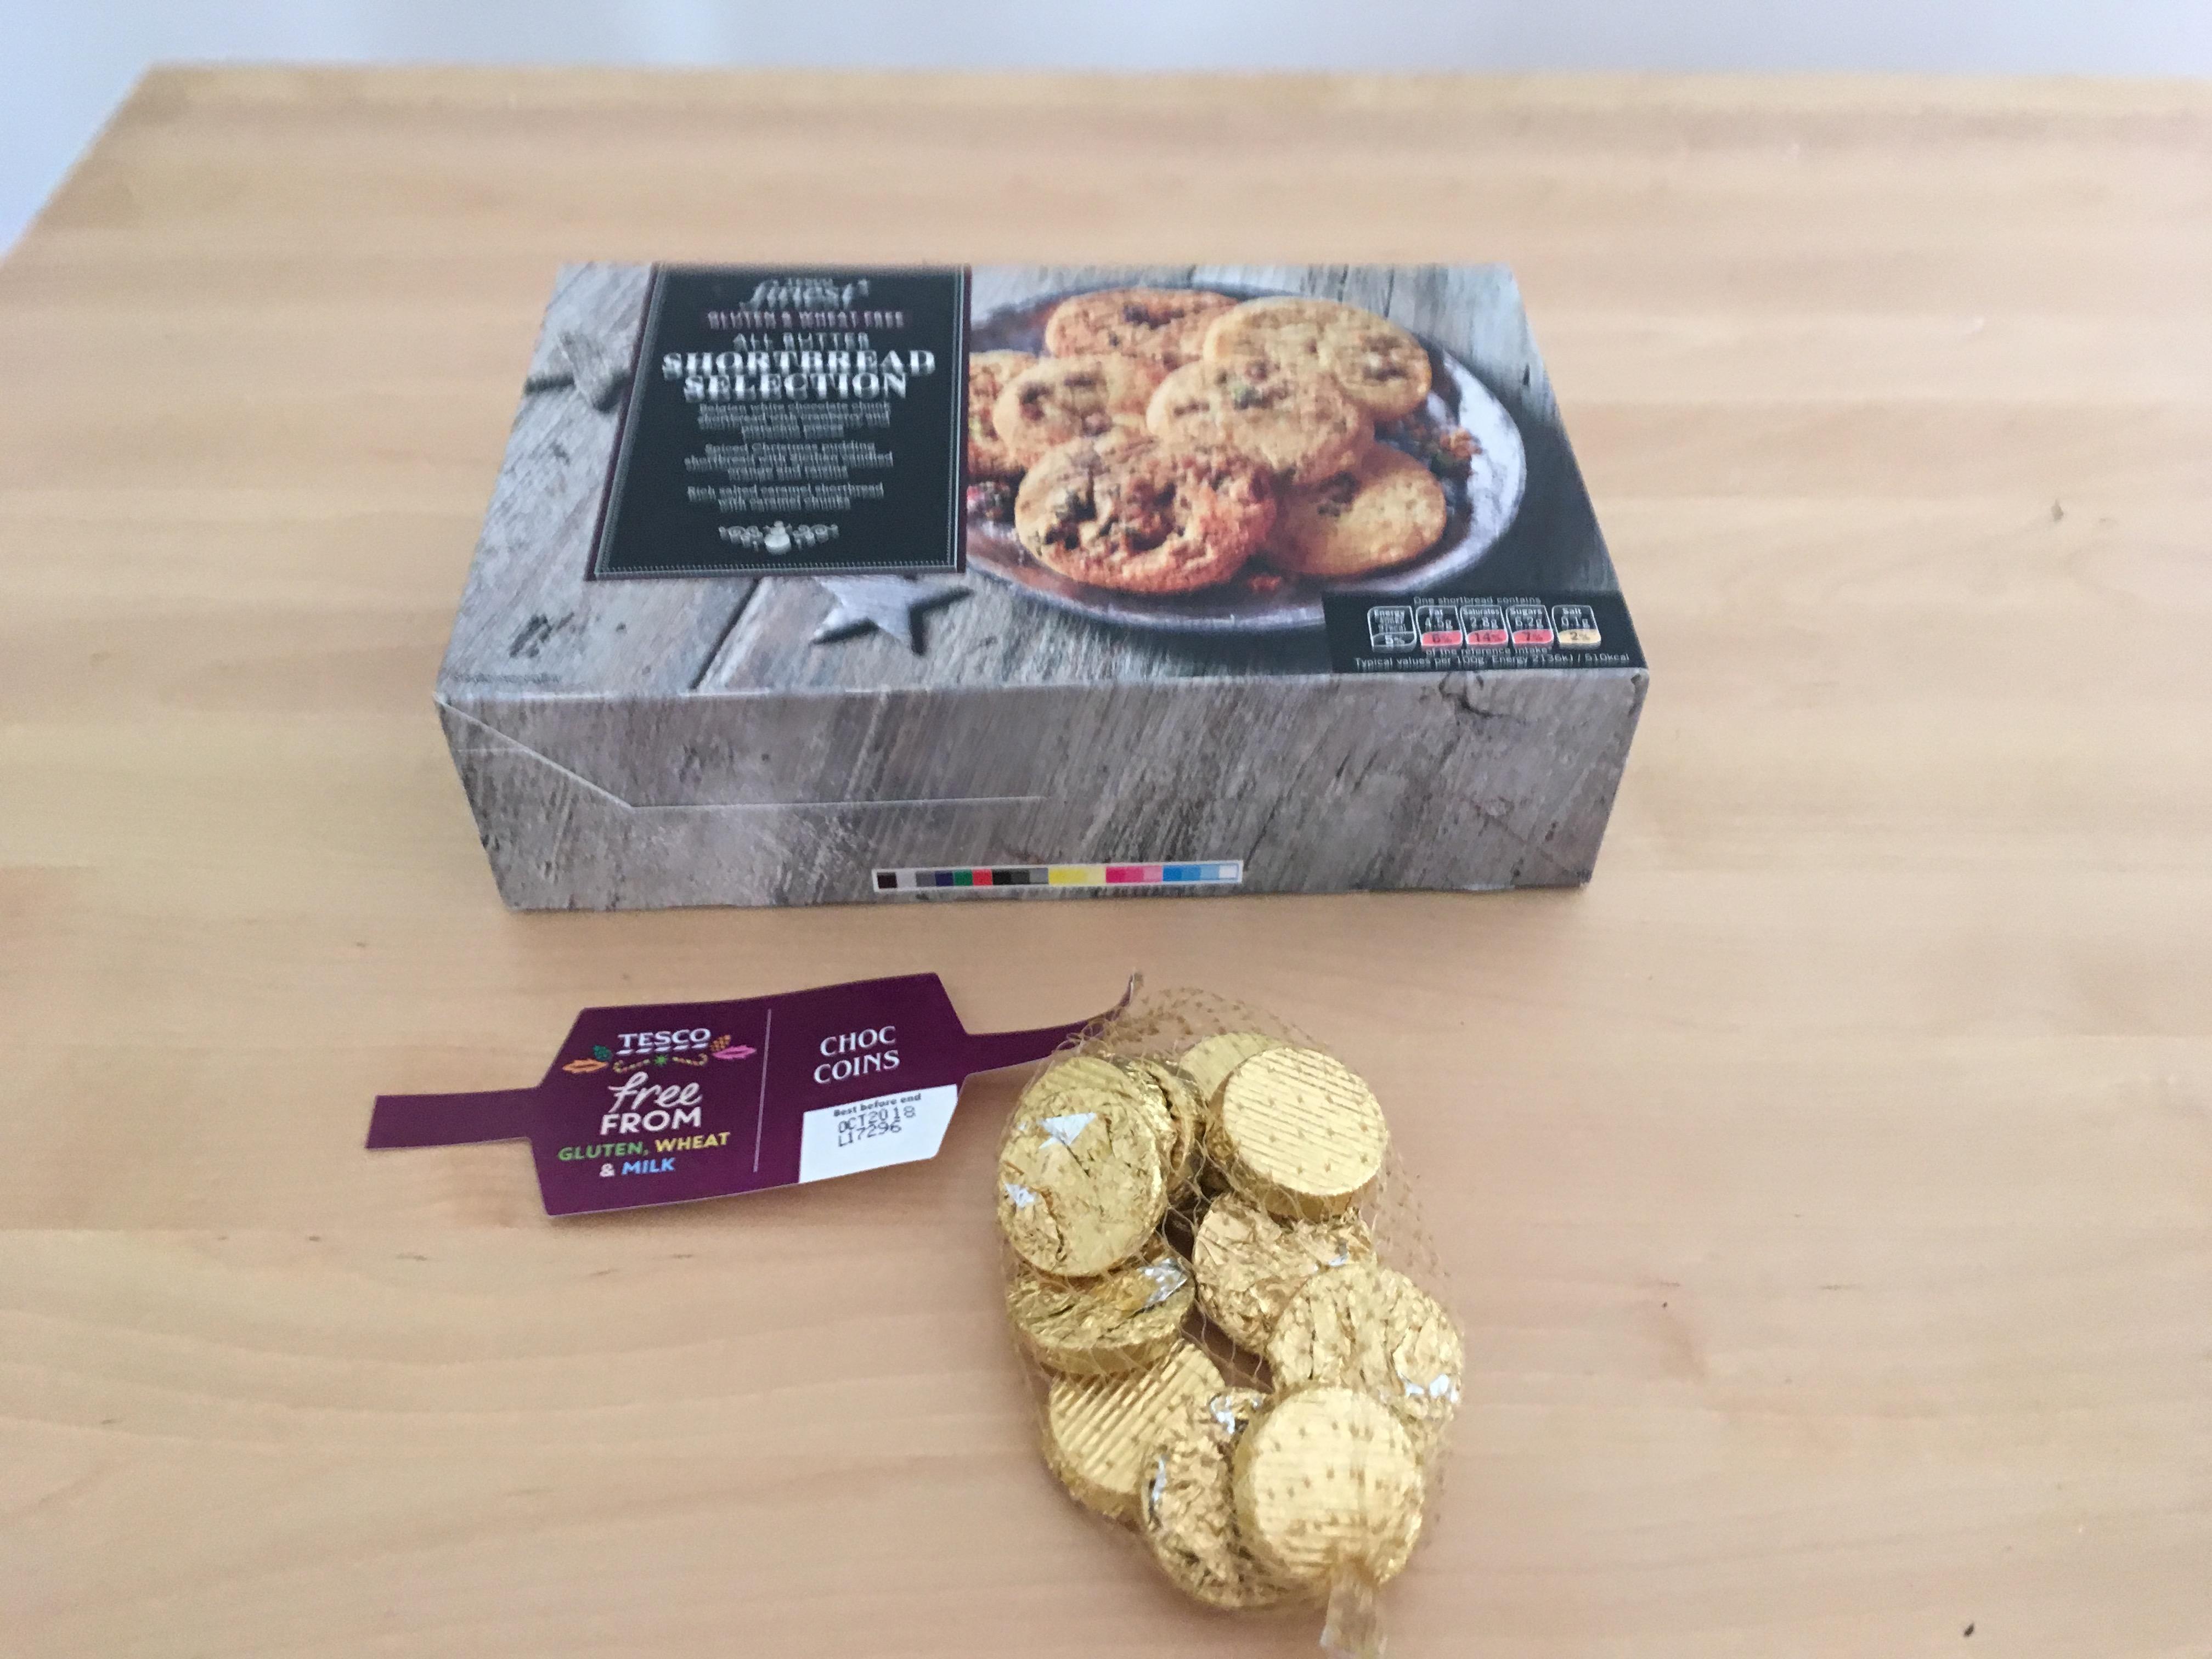 Tesco finest shortbread biscuits 450g - 4p instore